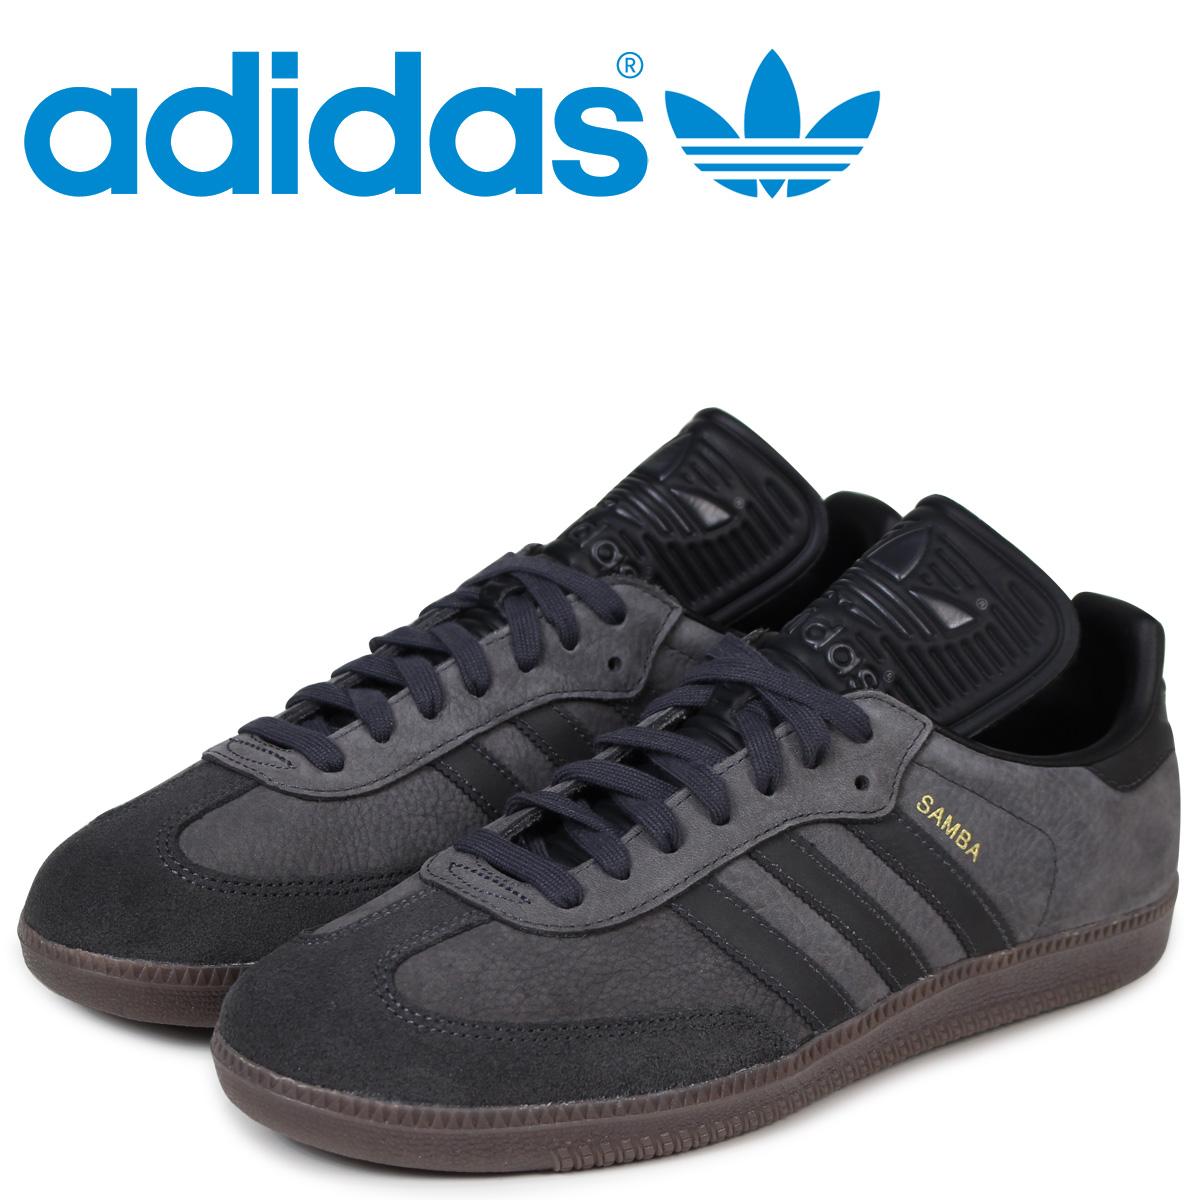 adidas Originals サンバ アディダス スニーカー SAMBA CLASSIC OG メンズ BZ0227 ブラック オリジナルス 【決算セール 返品不可】